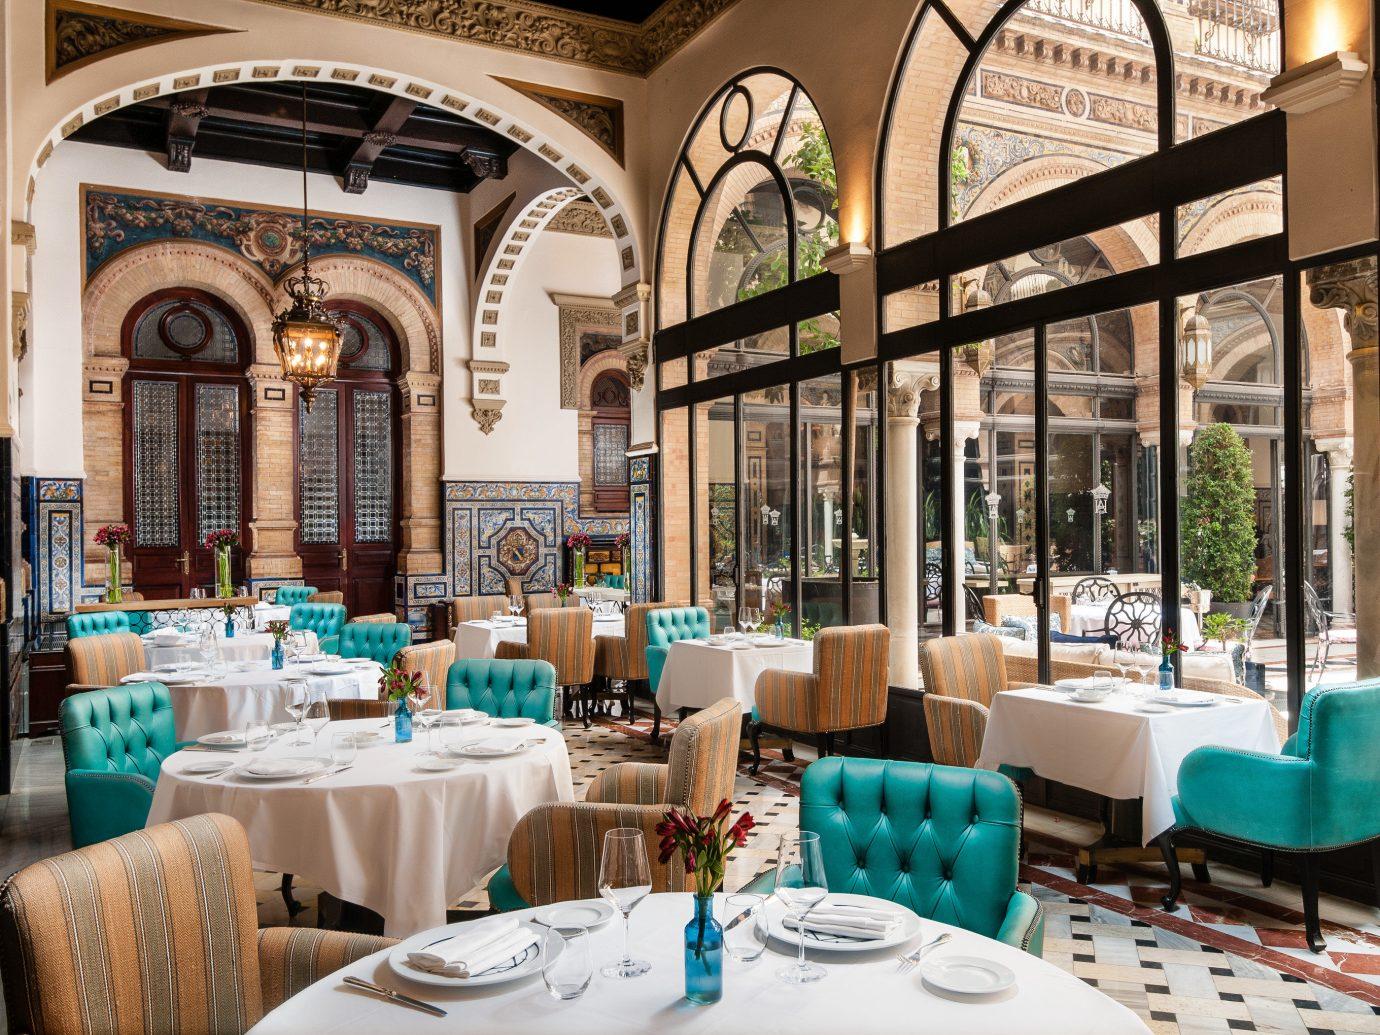 Trip Ideas restaurant estate interior design meal function hall several